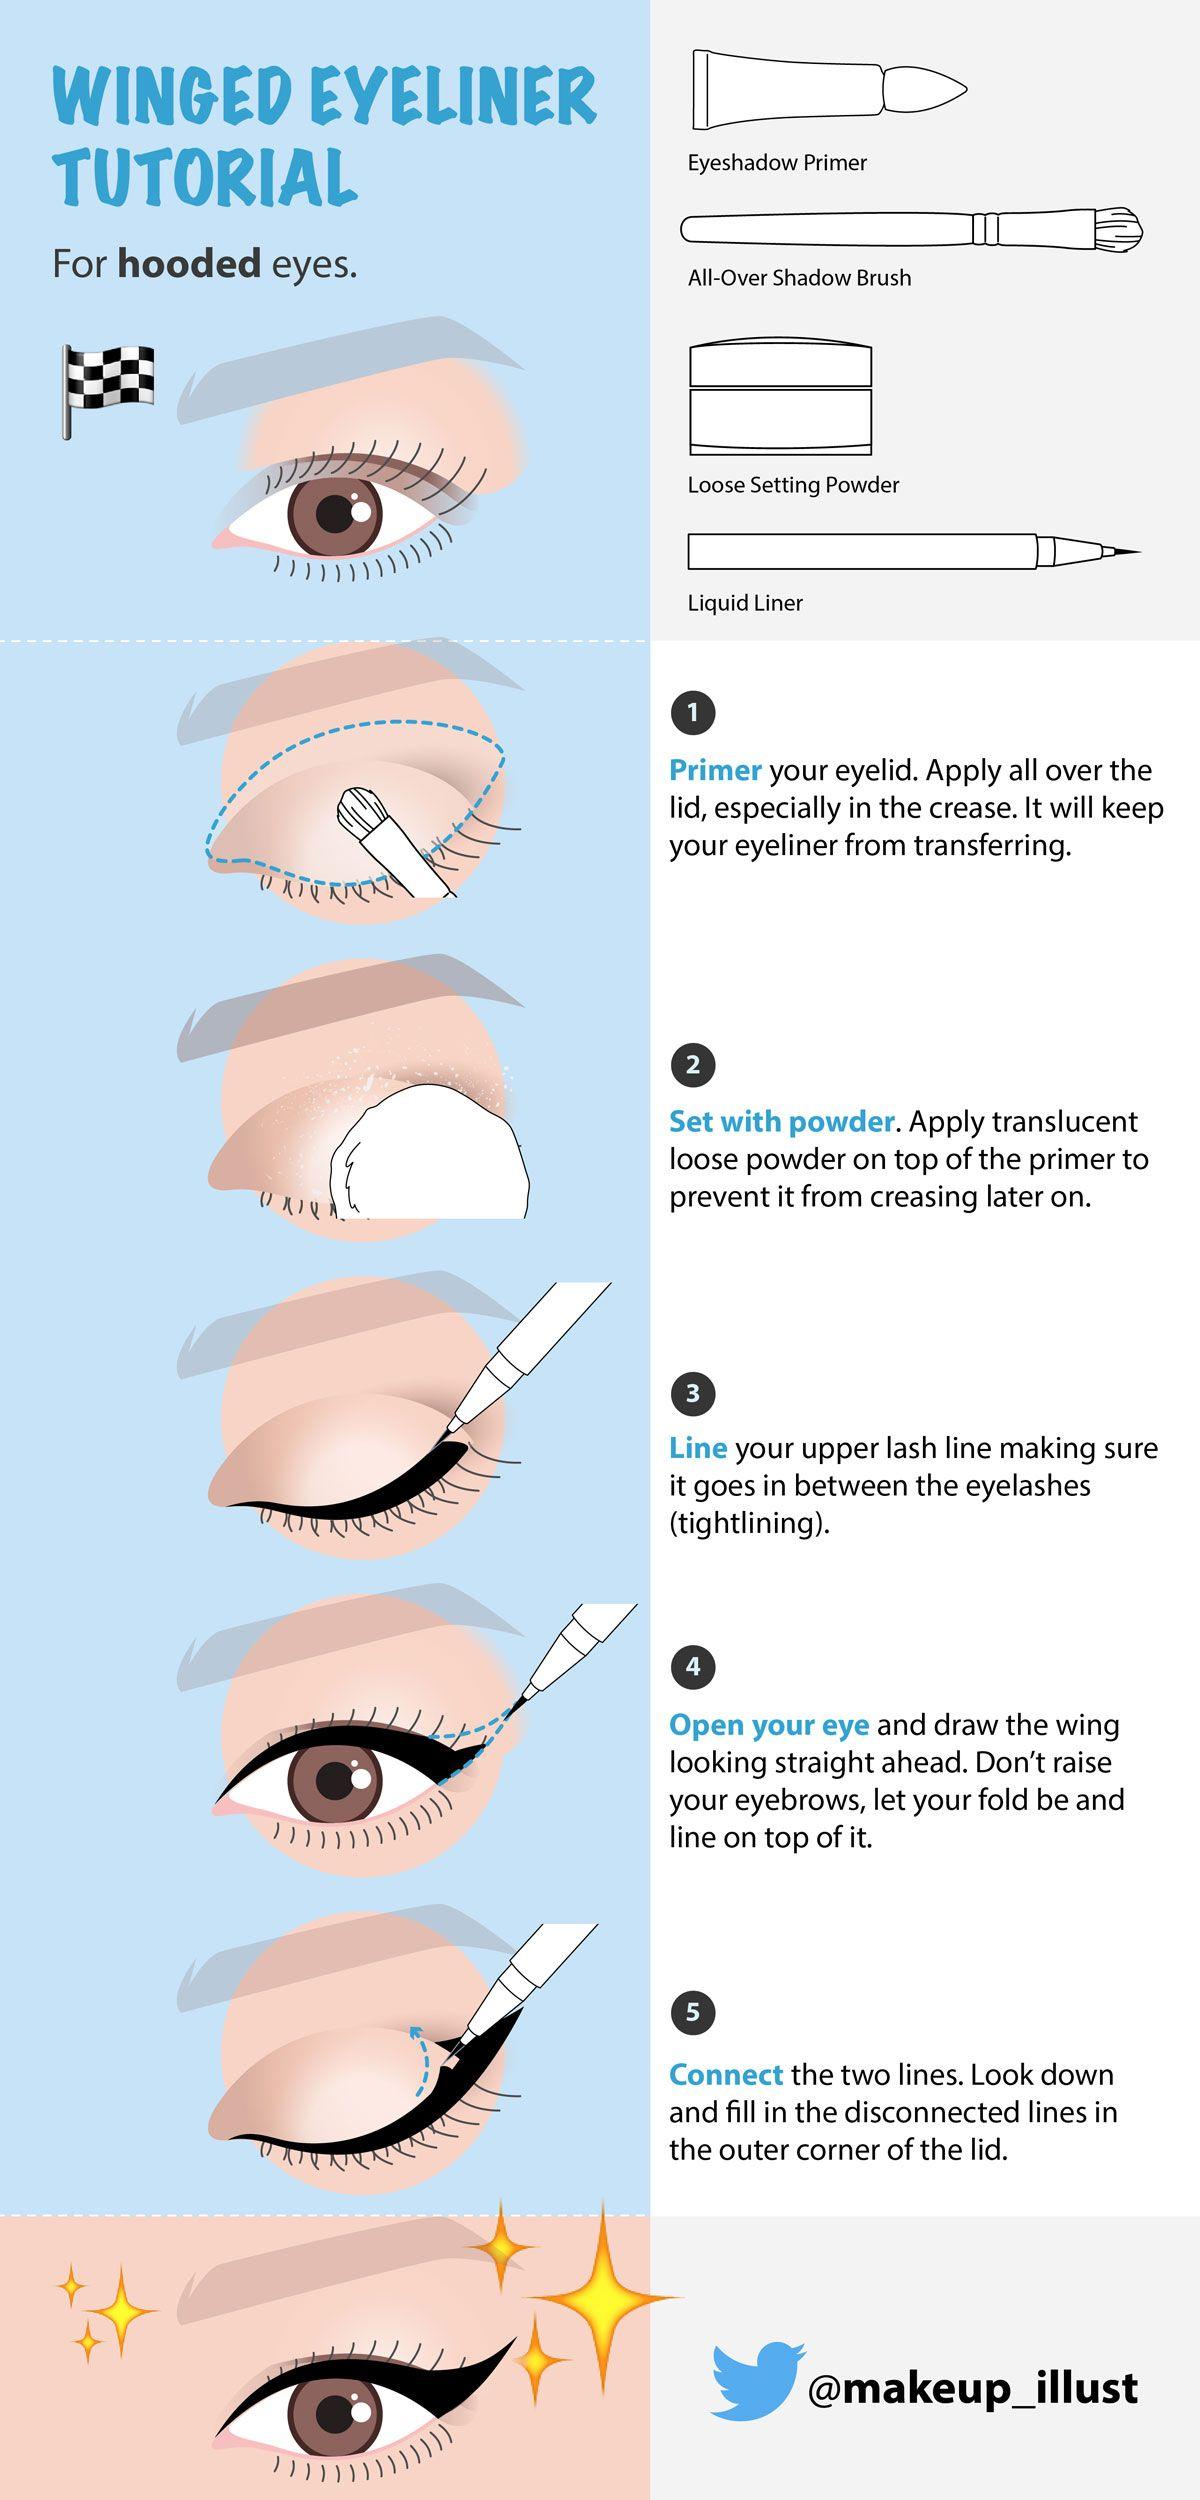 Winged Eyeliner Tutorial for Hooded Eyes [Illustrated!]